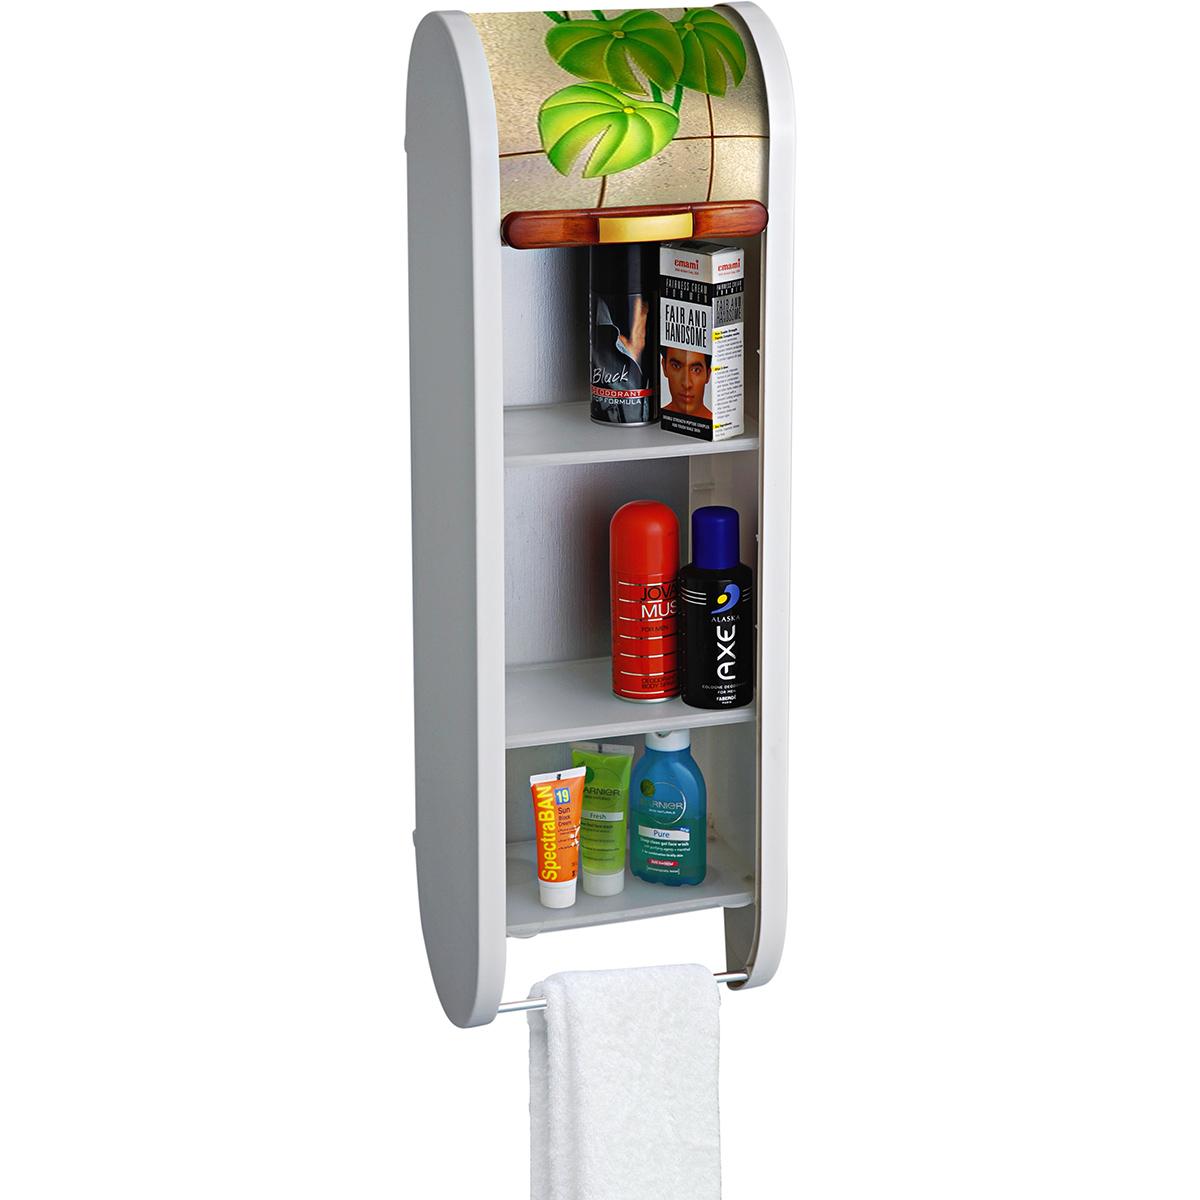 Washbasin Cabinets India Online   Cabinet biji. Vanity Bathroom Units India   Rukinet com